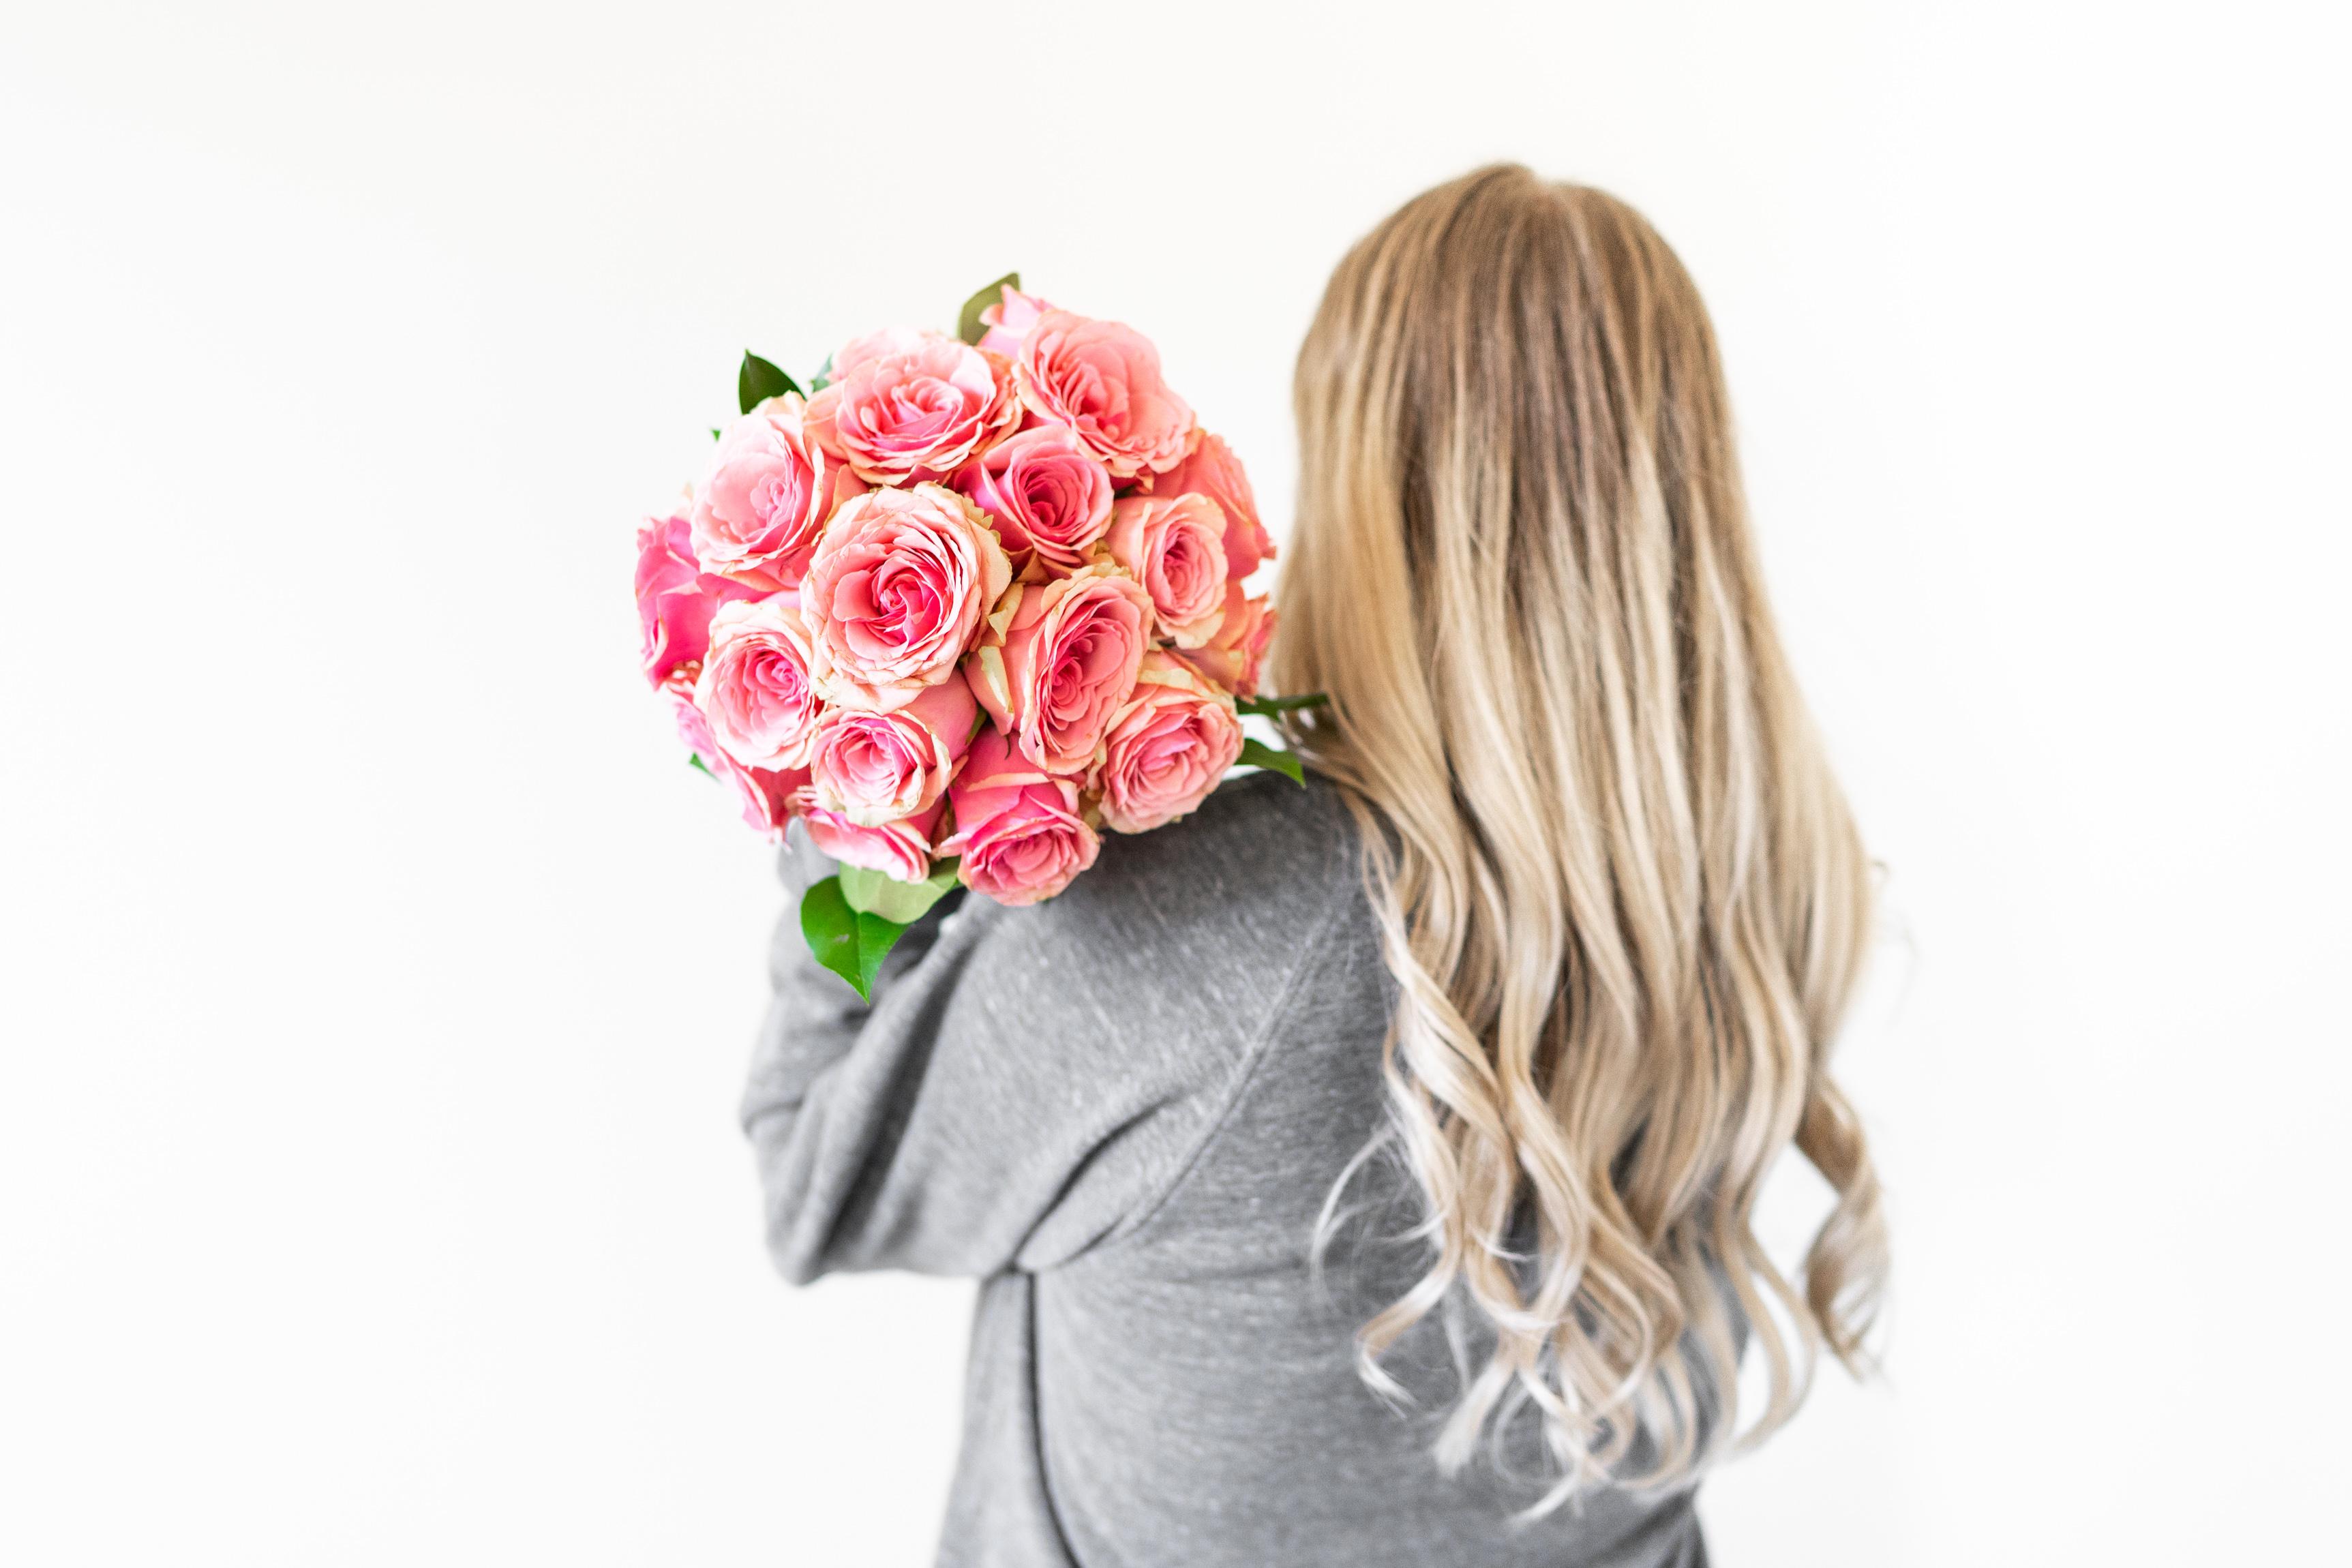 The Top 5 Favorite Pink Flower Arrangements